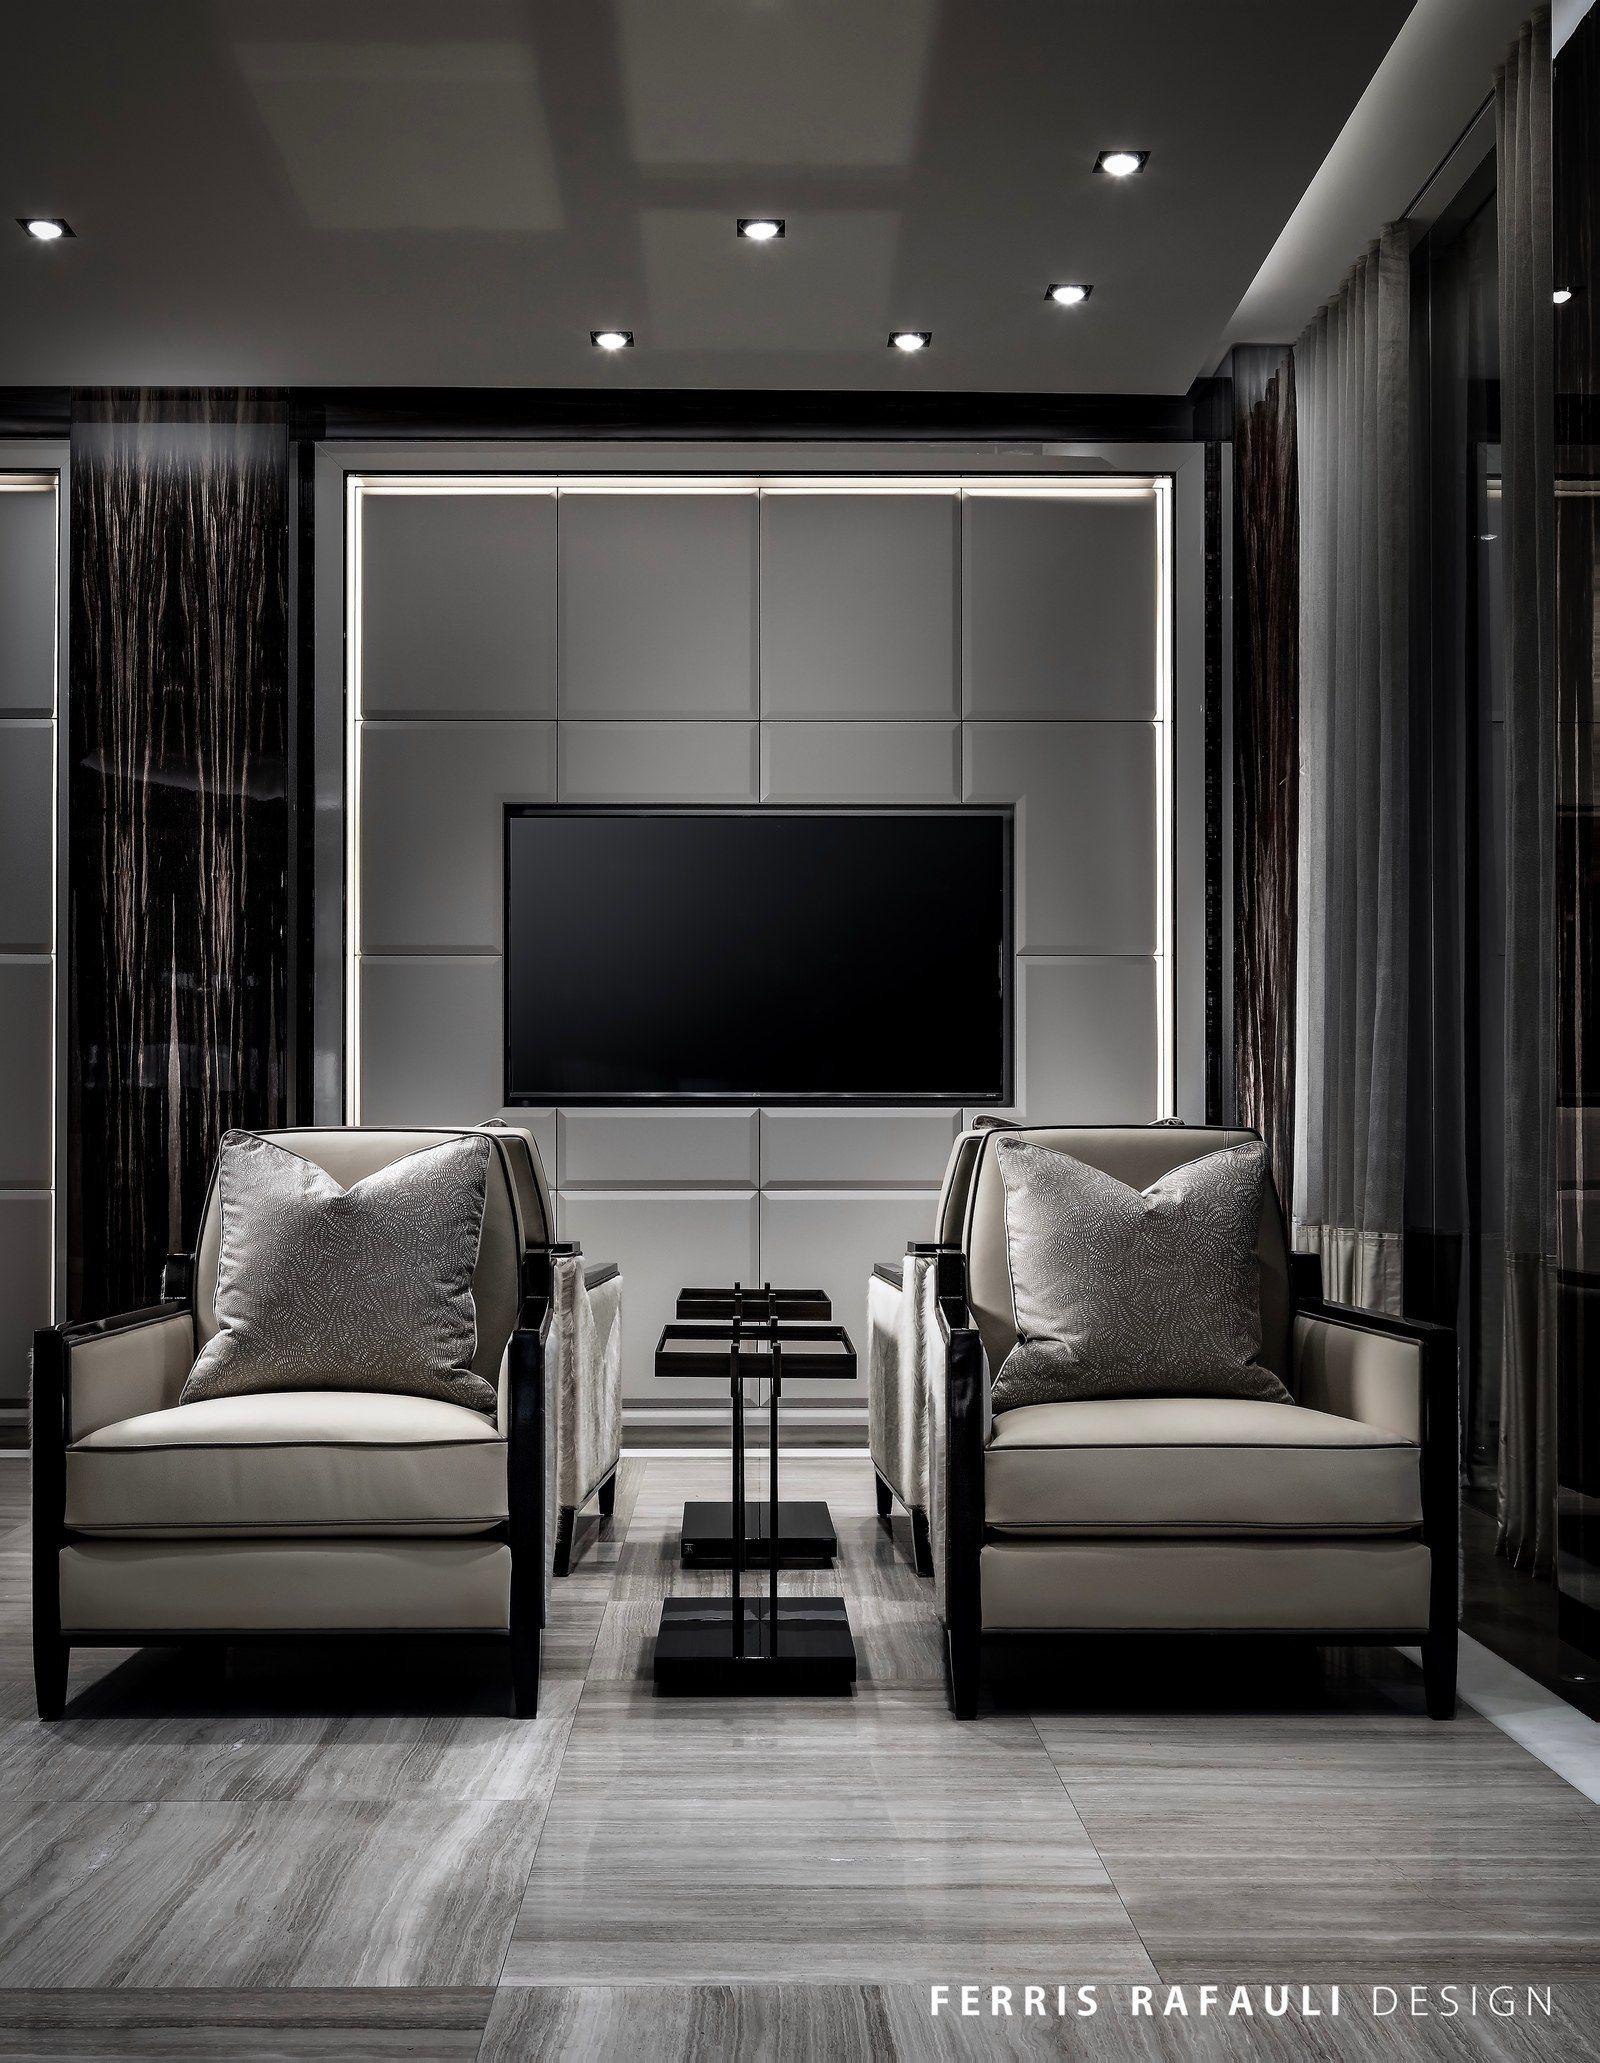 Living Room Wall Panel Design: Architecture By Ferris Rafauli